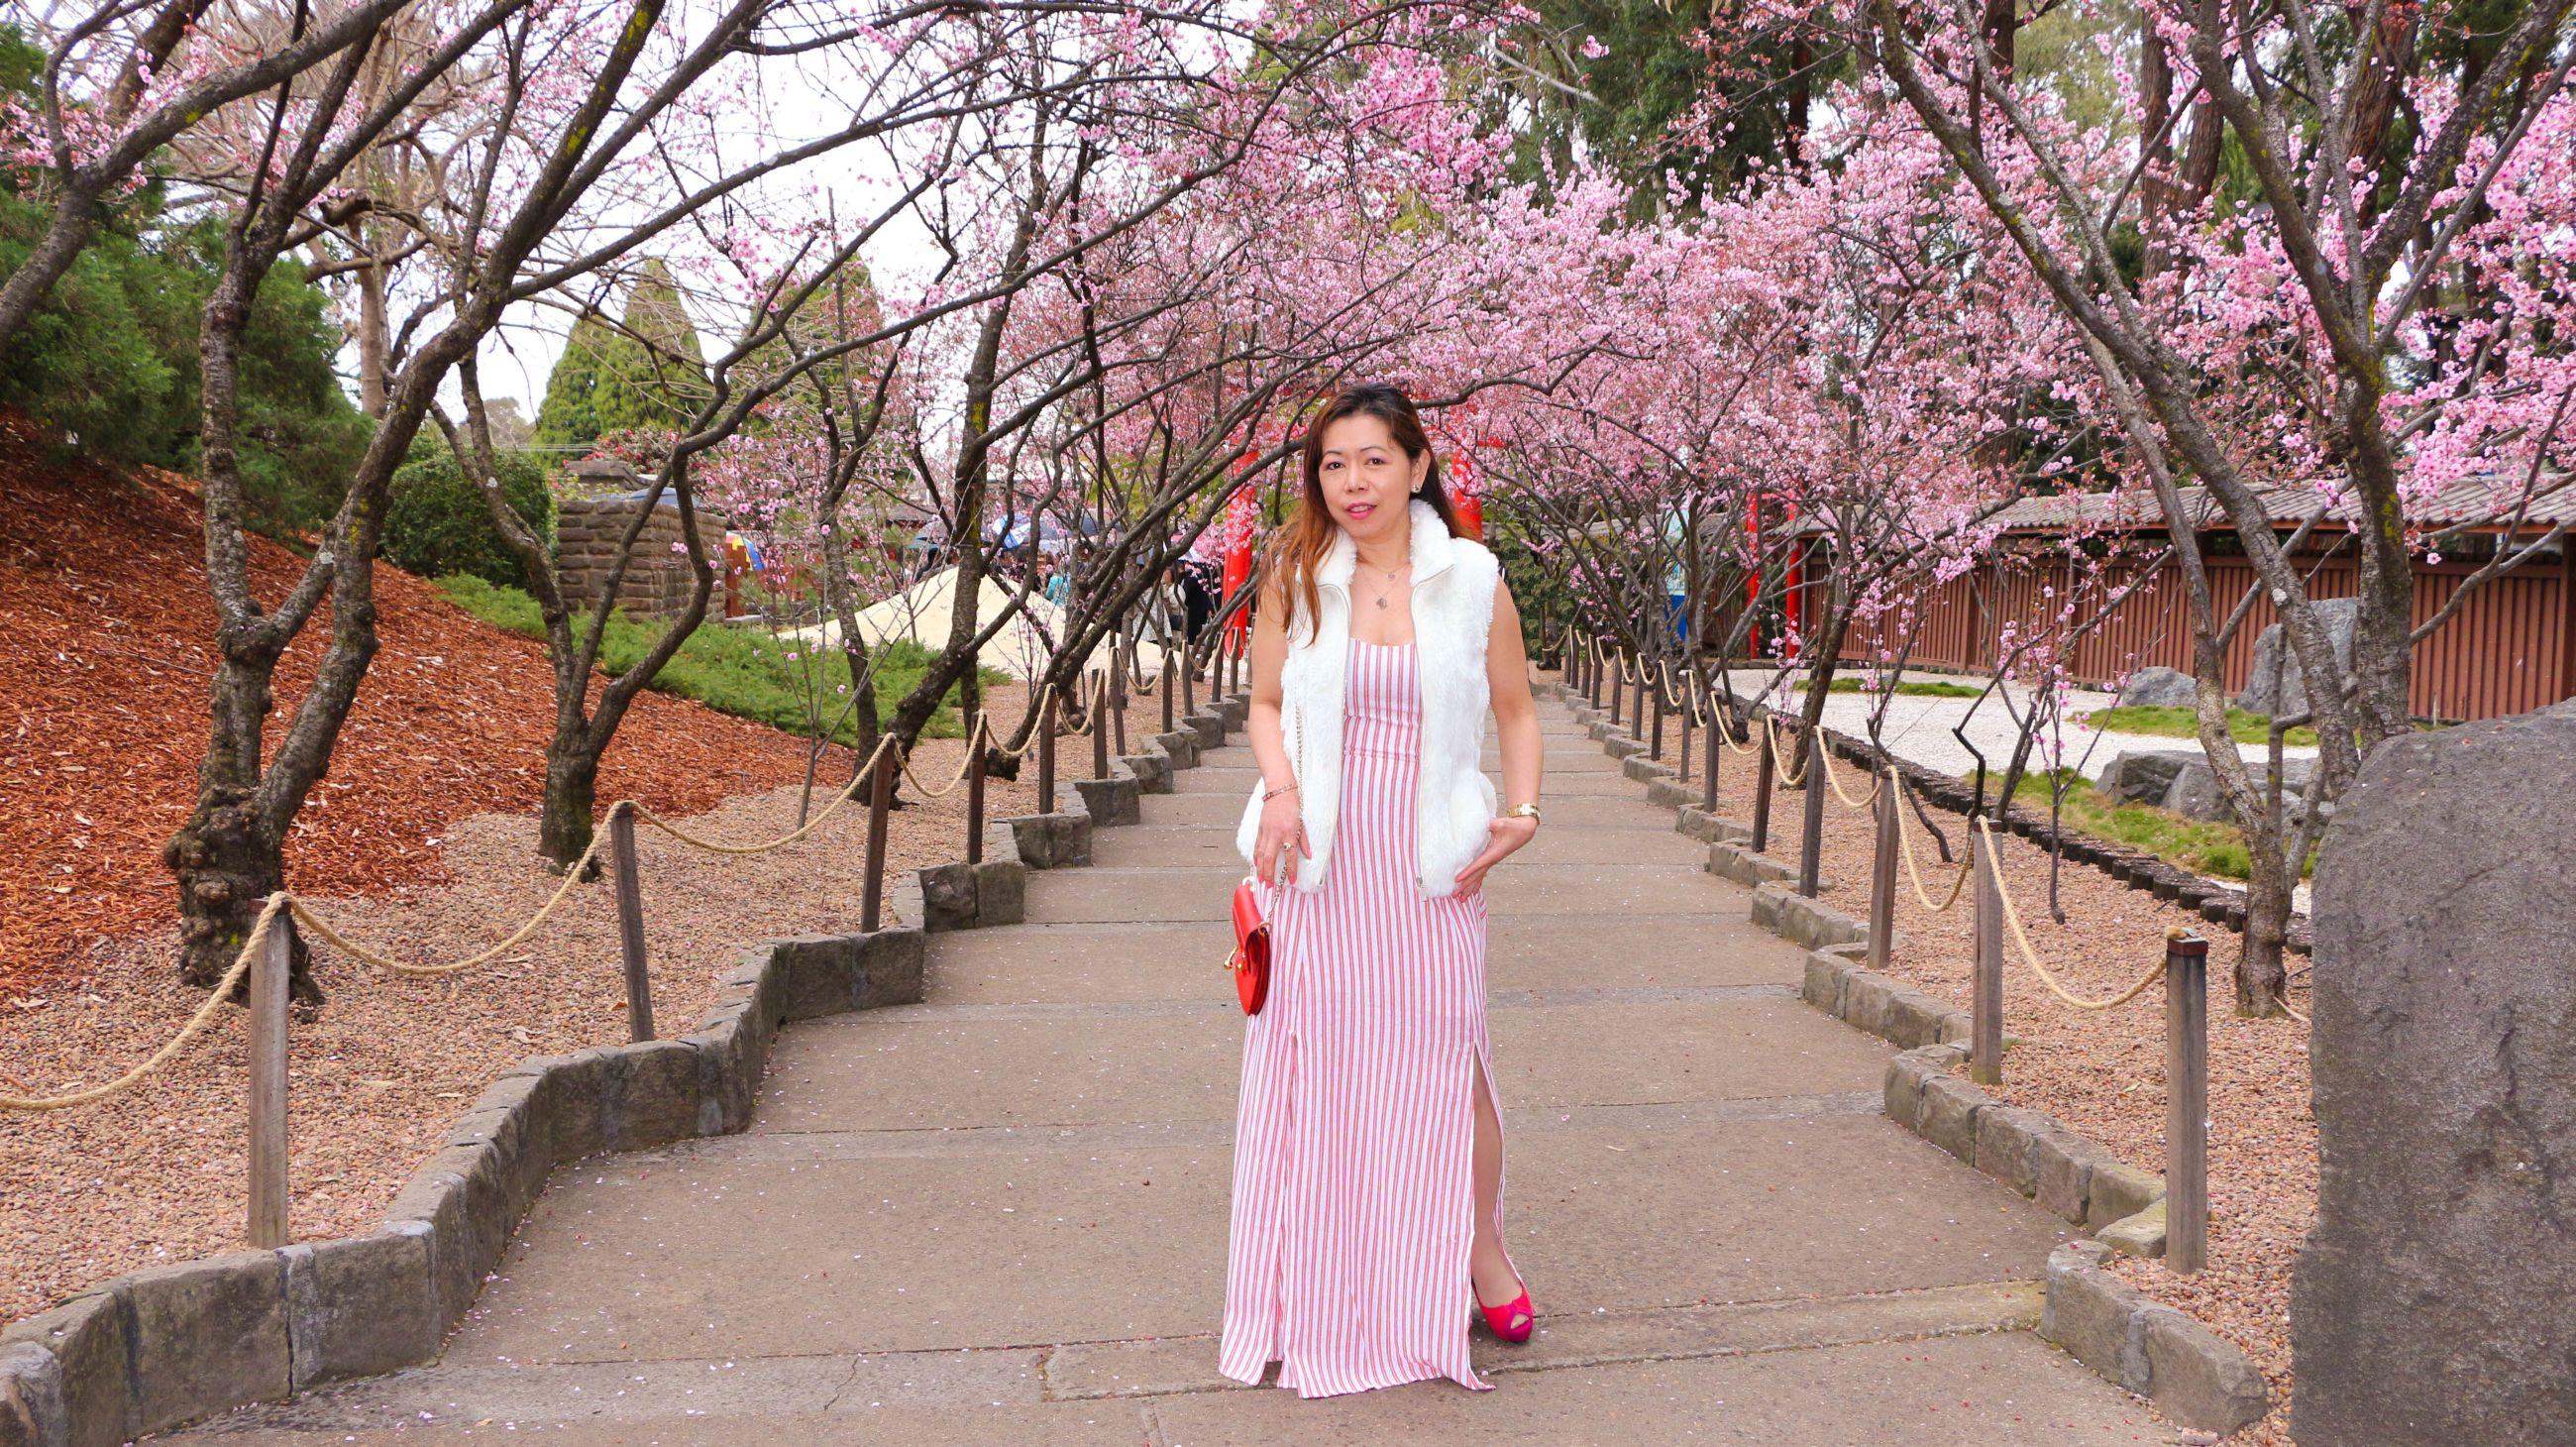 What to wear in Cherry blossom garden